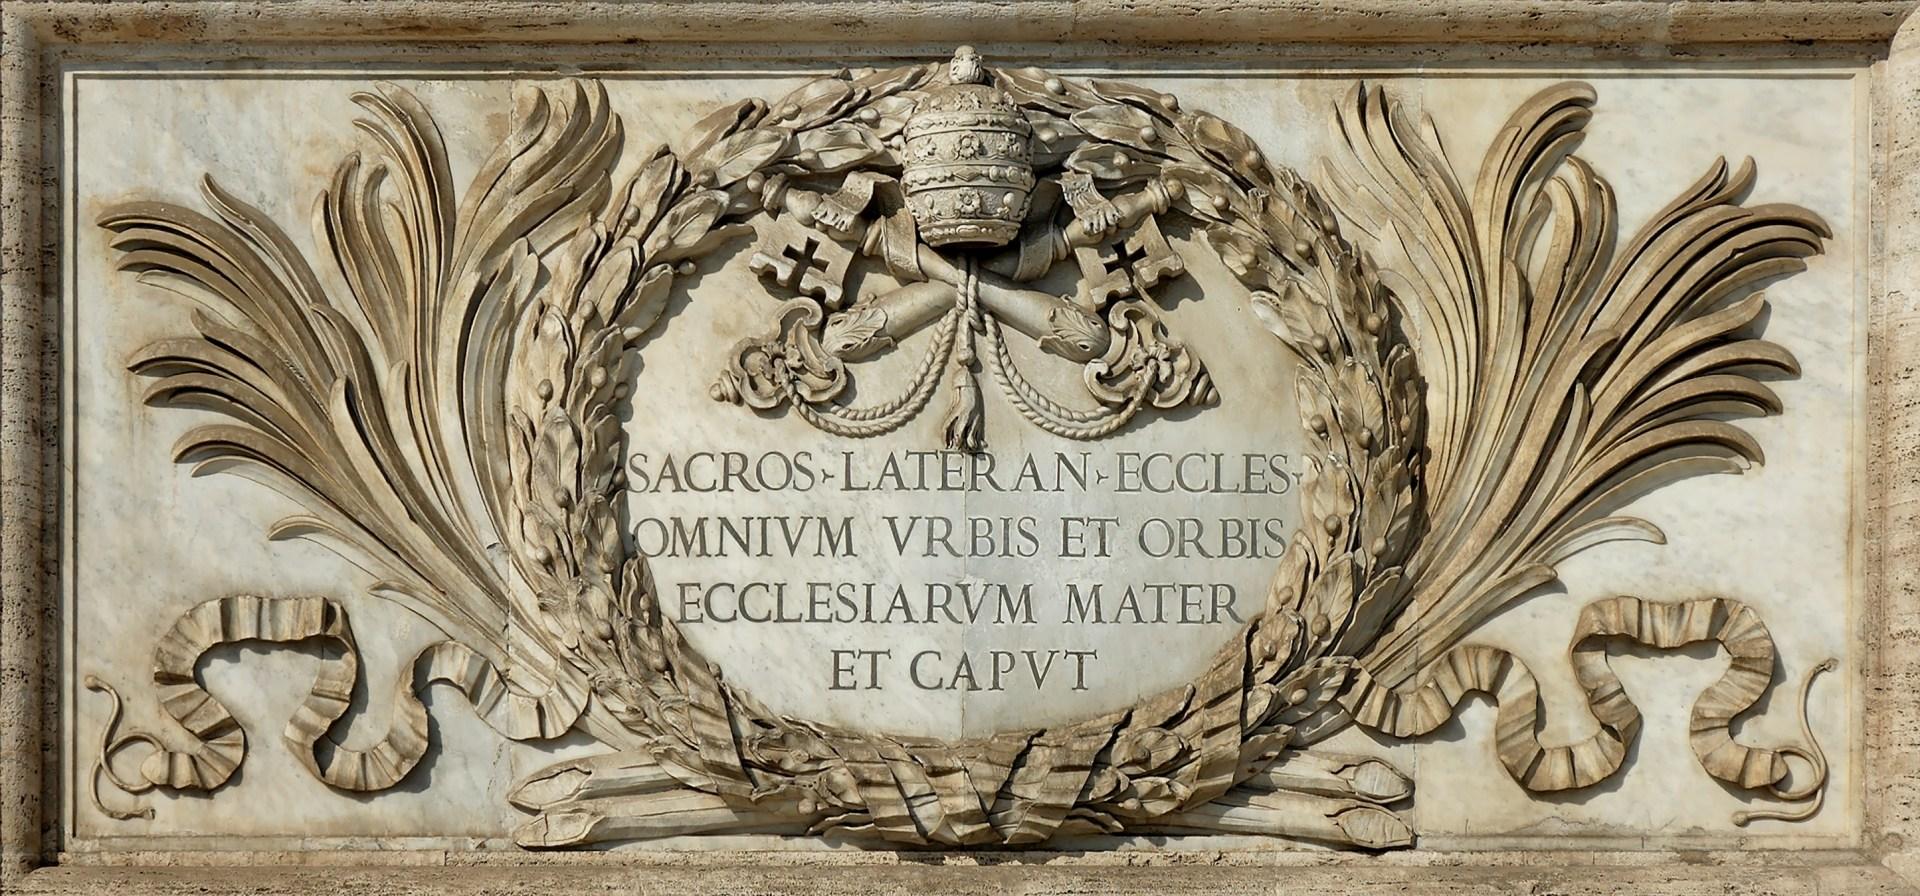 https://wp.en.aleteia.org/wp-content/uploads/sites/2/2021/01/6Inscription_Ecclesiarum_Mater_San_Giovanni_in_Laterano_2006-09-07-1.jpg?w=1920